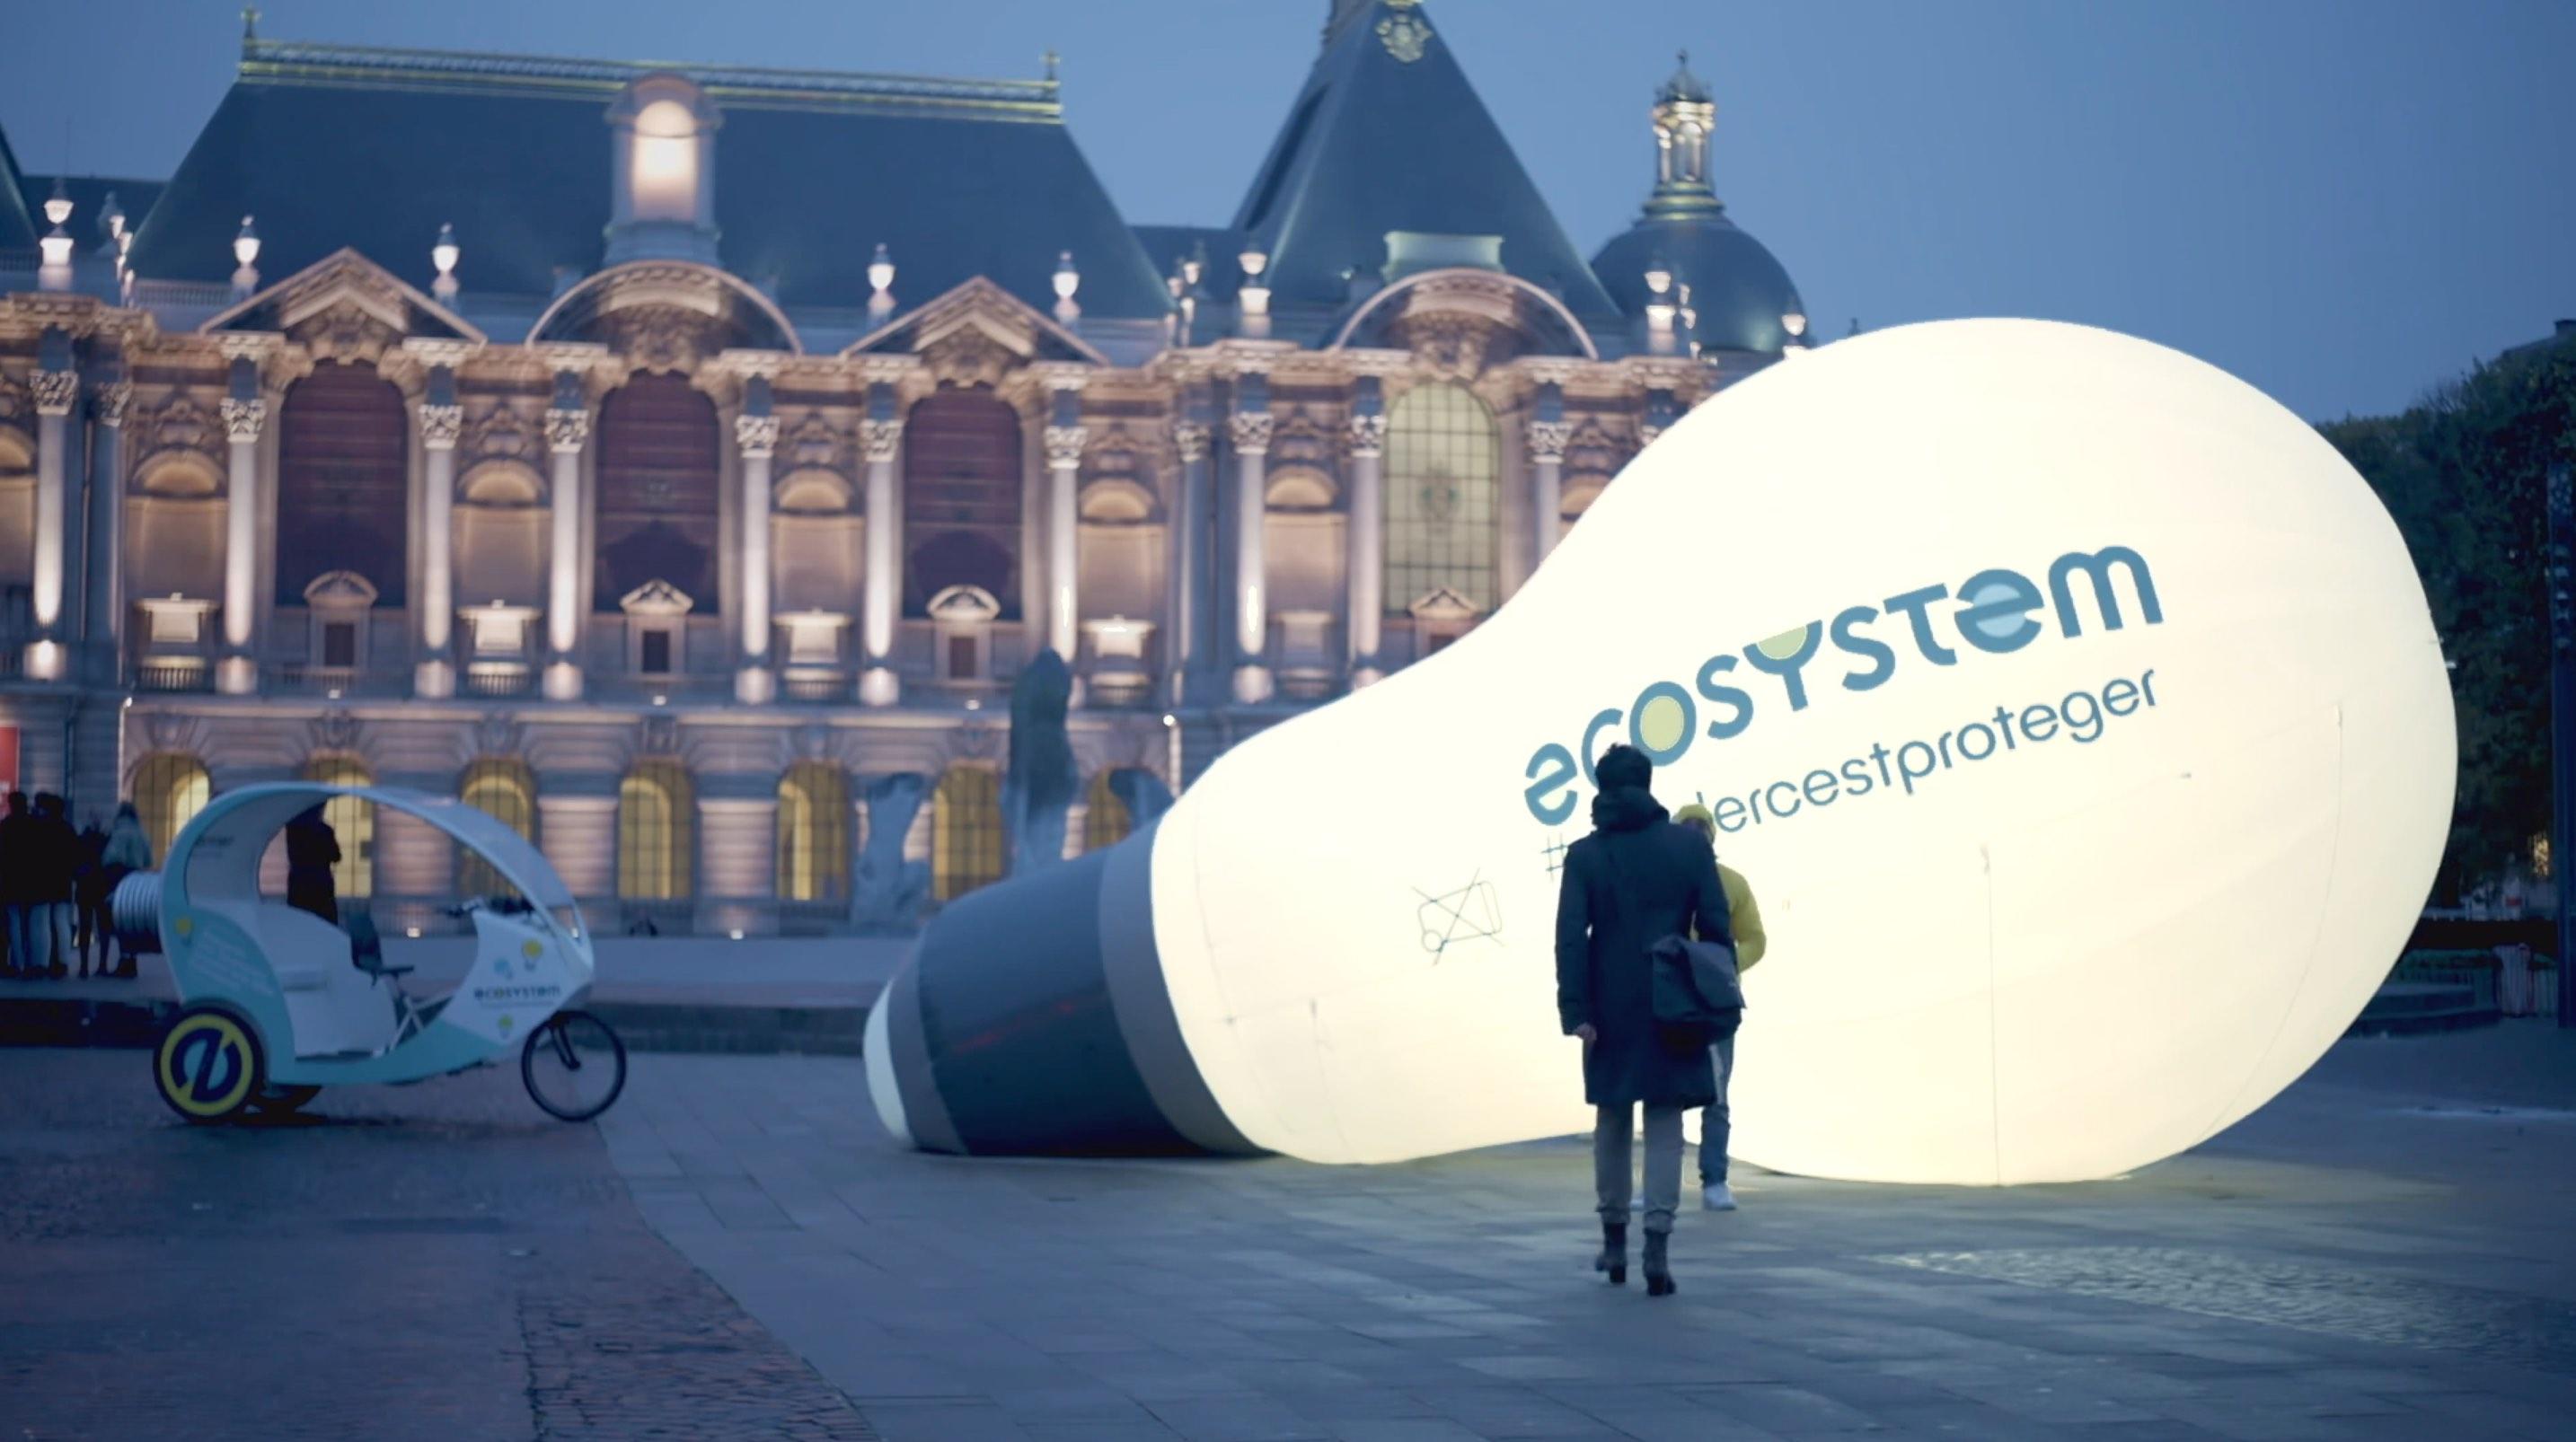 Notchup Ecosystem campagne globale nationale activation sensibilisation ampoules géantes #recyclercestproteger